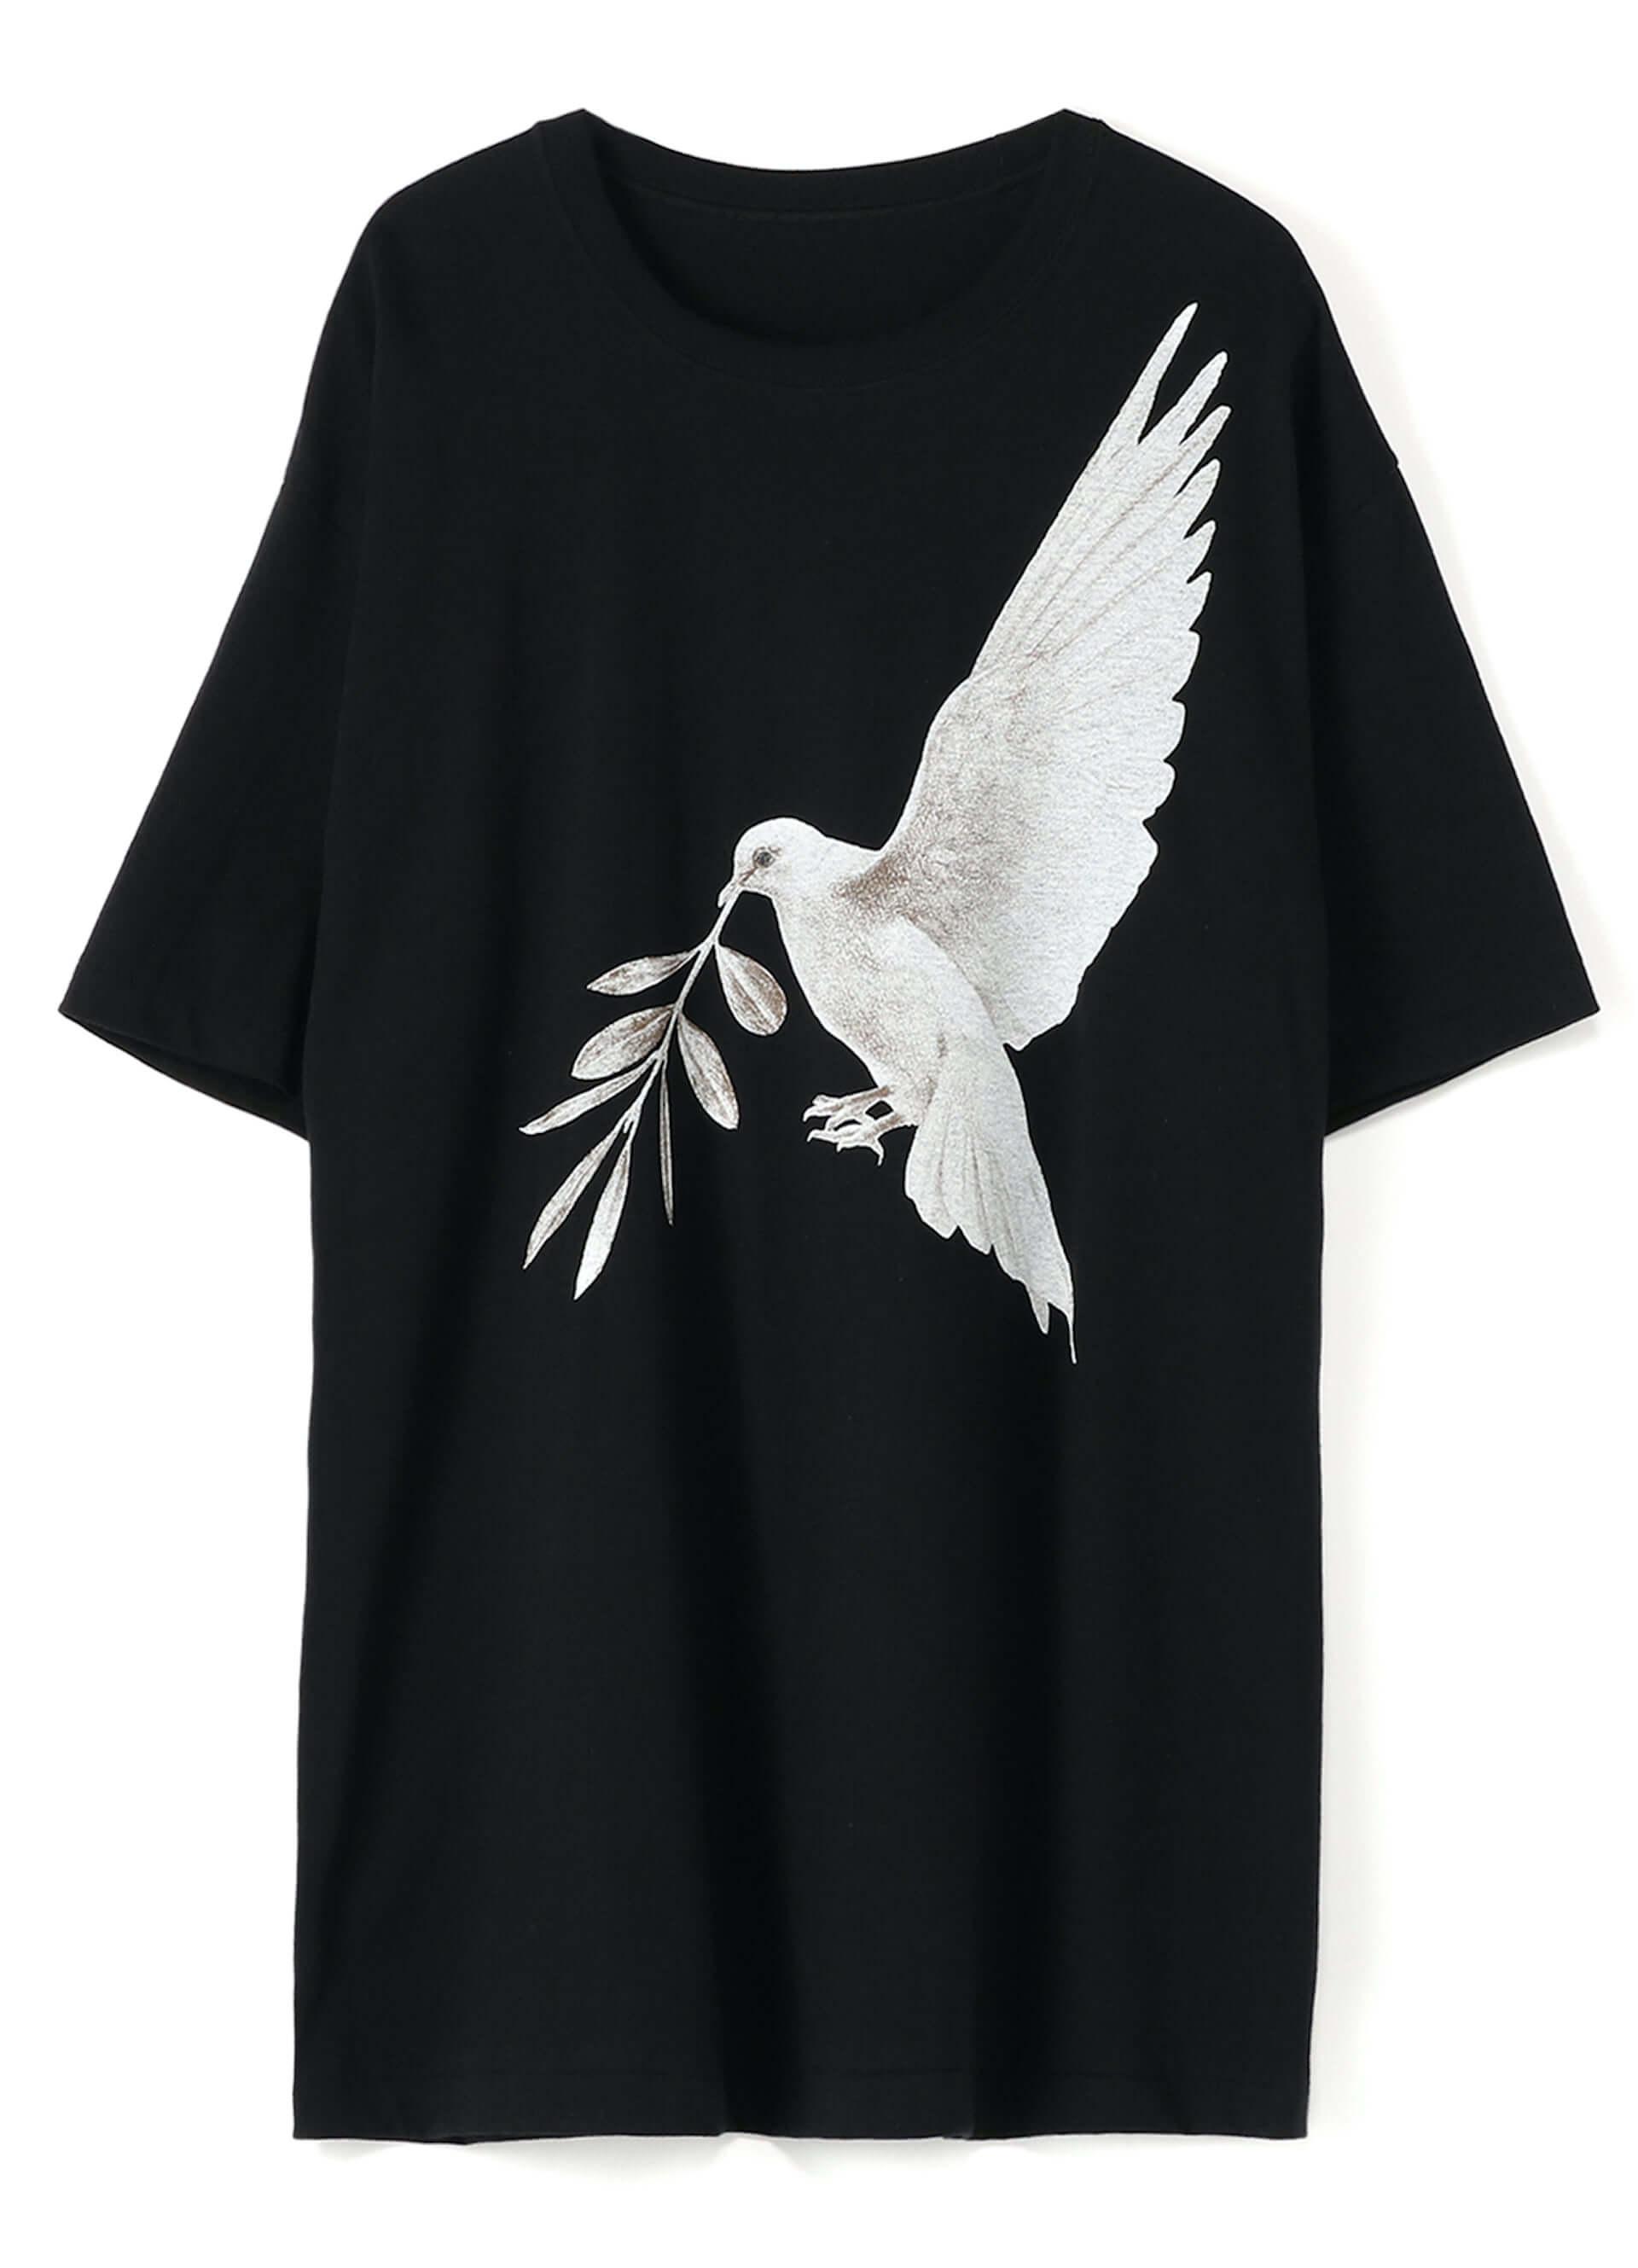 YOHJI YAMAMOTO +NOIRと画家 内田すずめがコラボした「Tシャツ+マスク」が限定販売!鳩や手の平のモチーフ3型 lf200604_yohjiyamamoto_04-1920x2658